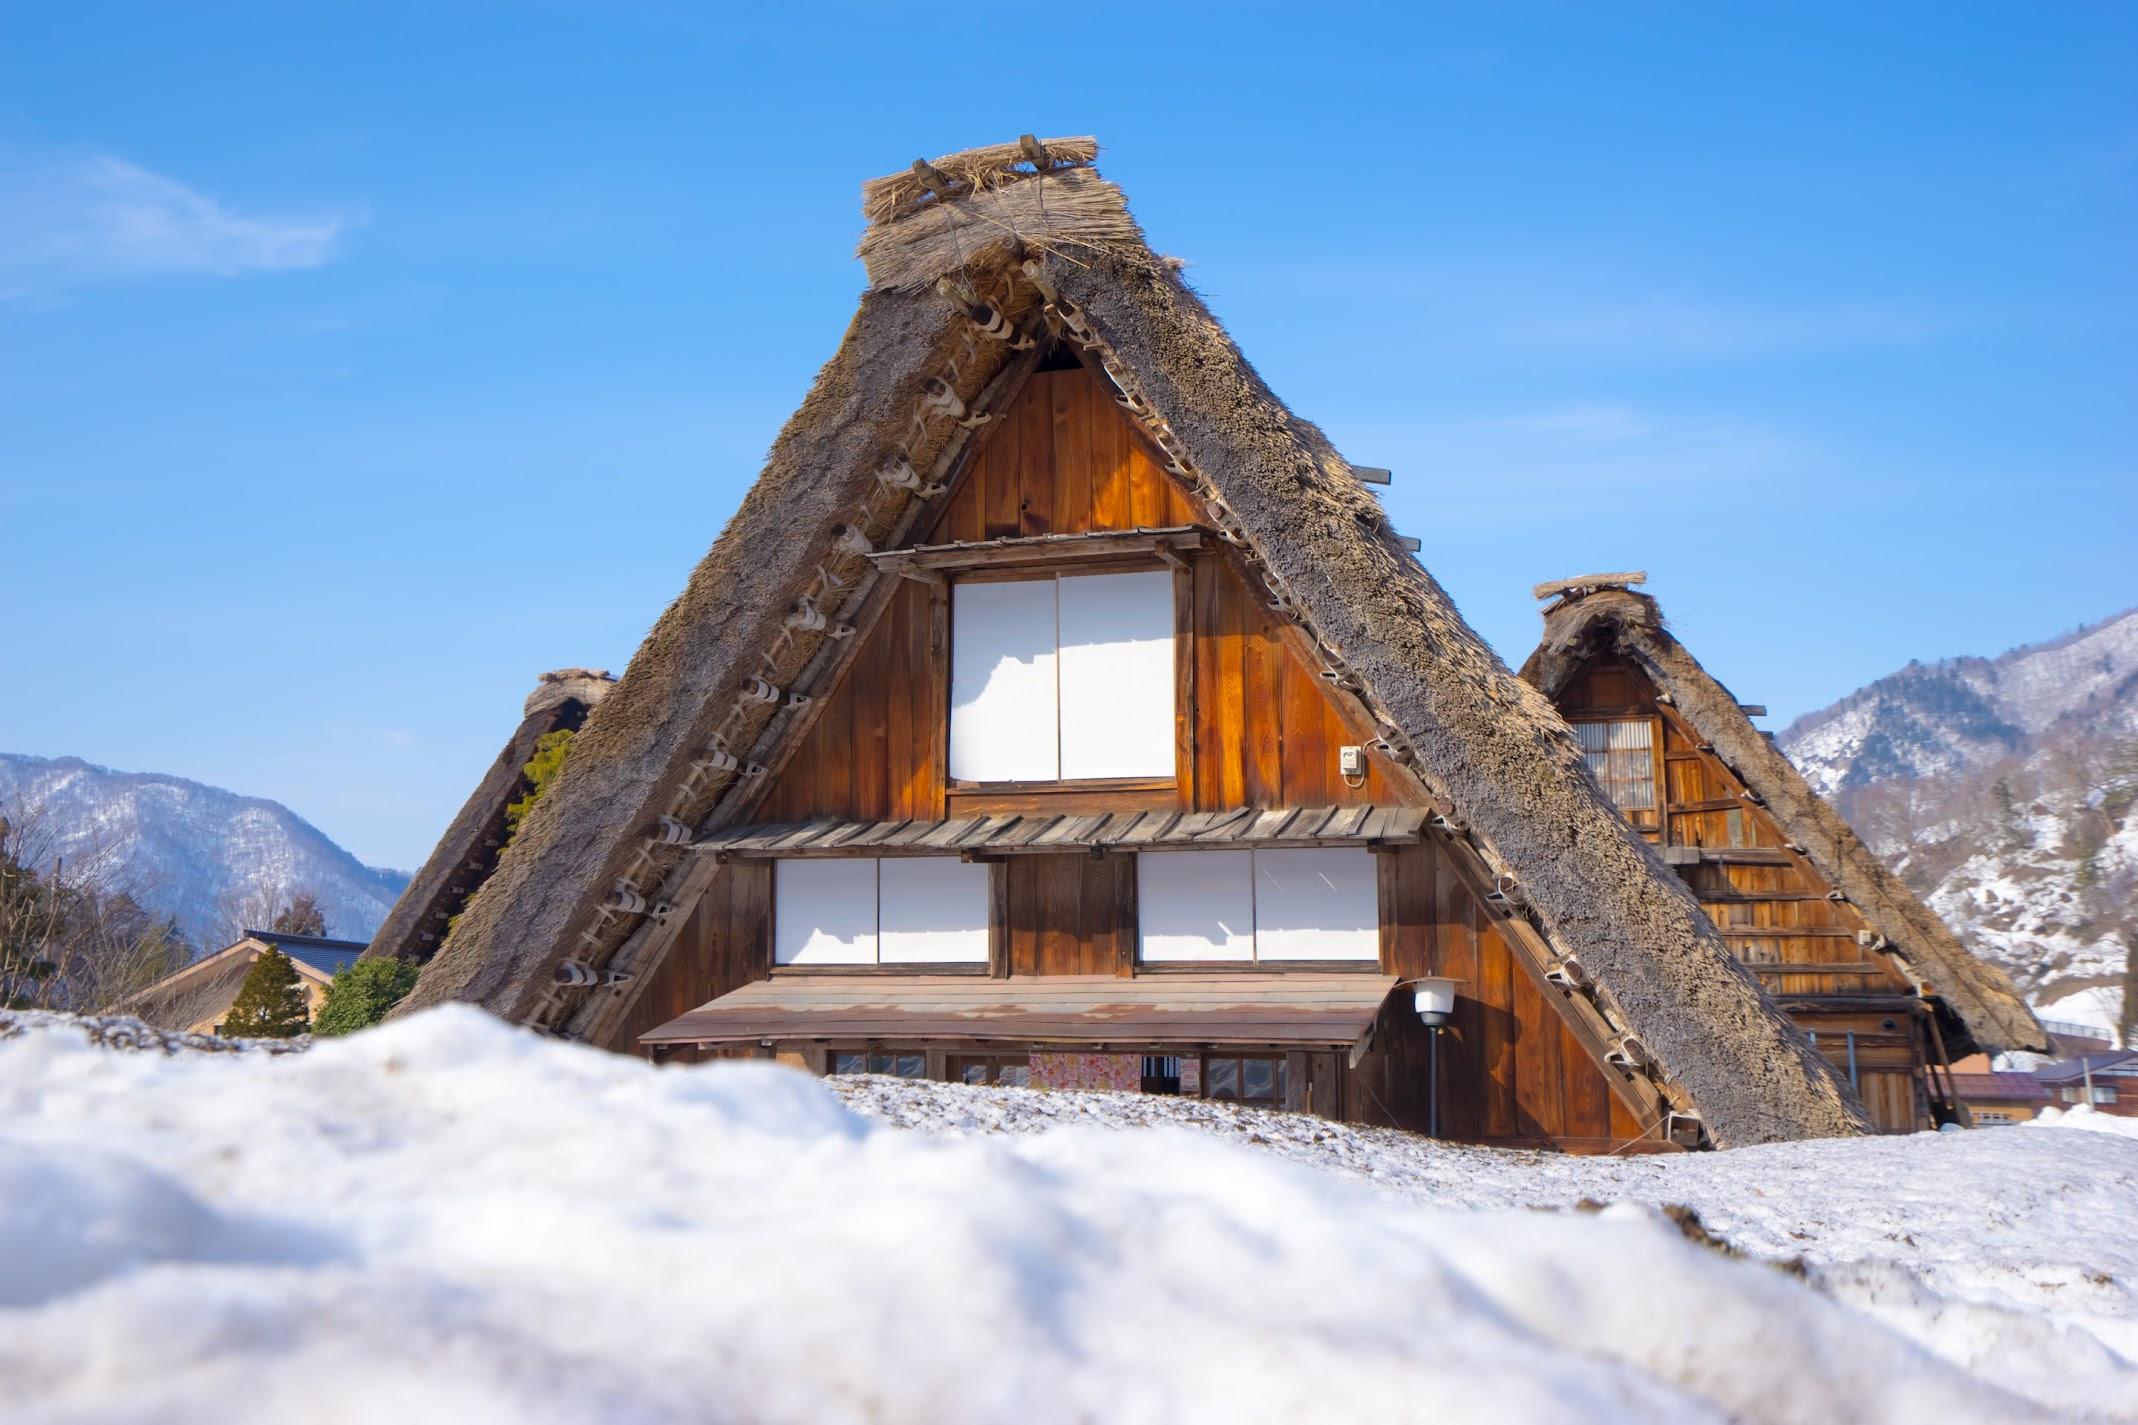 Shirakawa-go gassho style house1